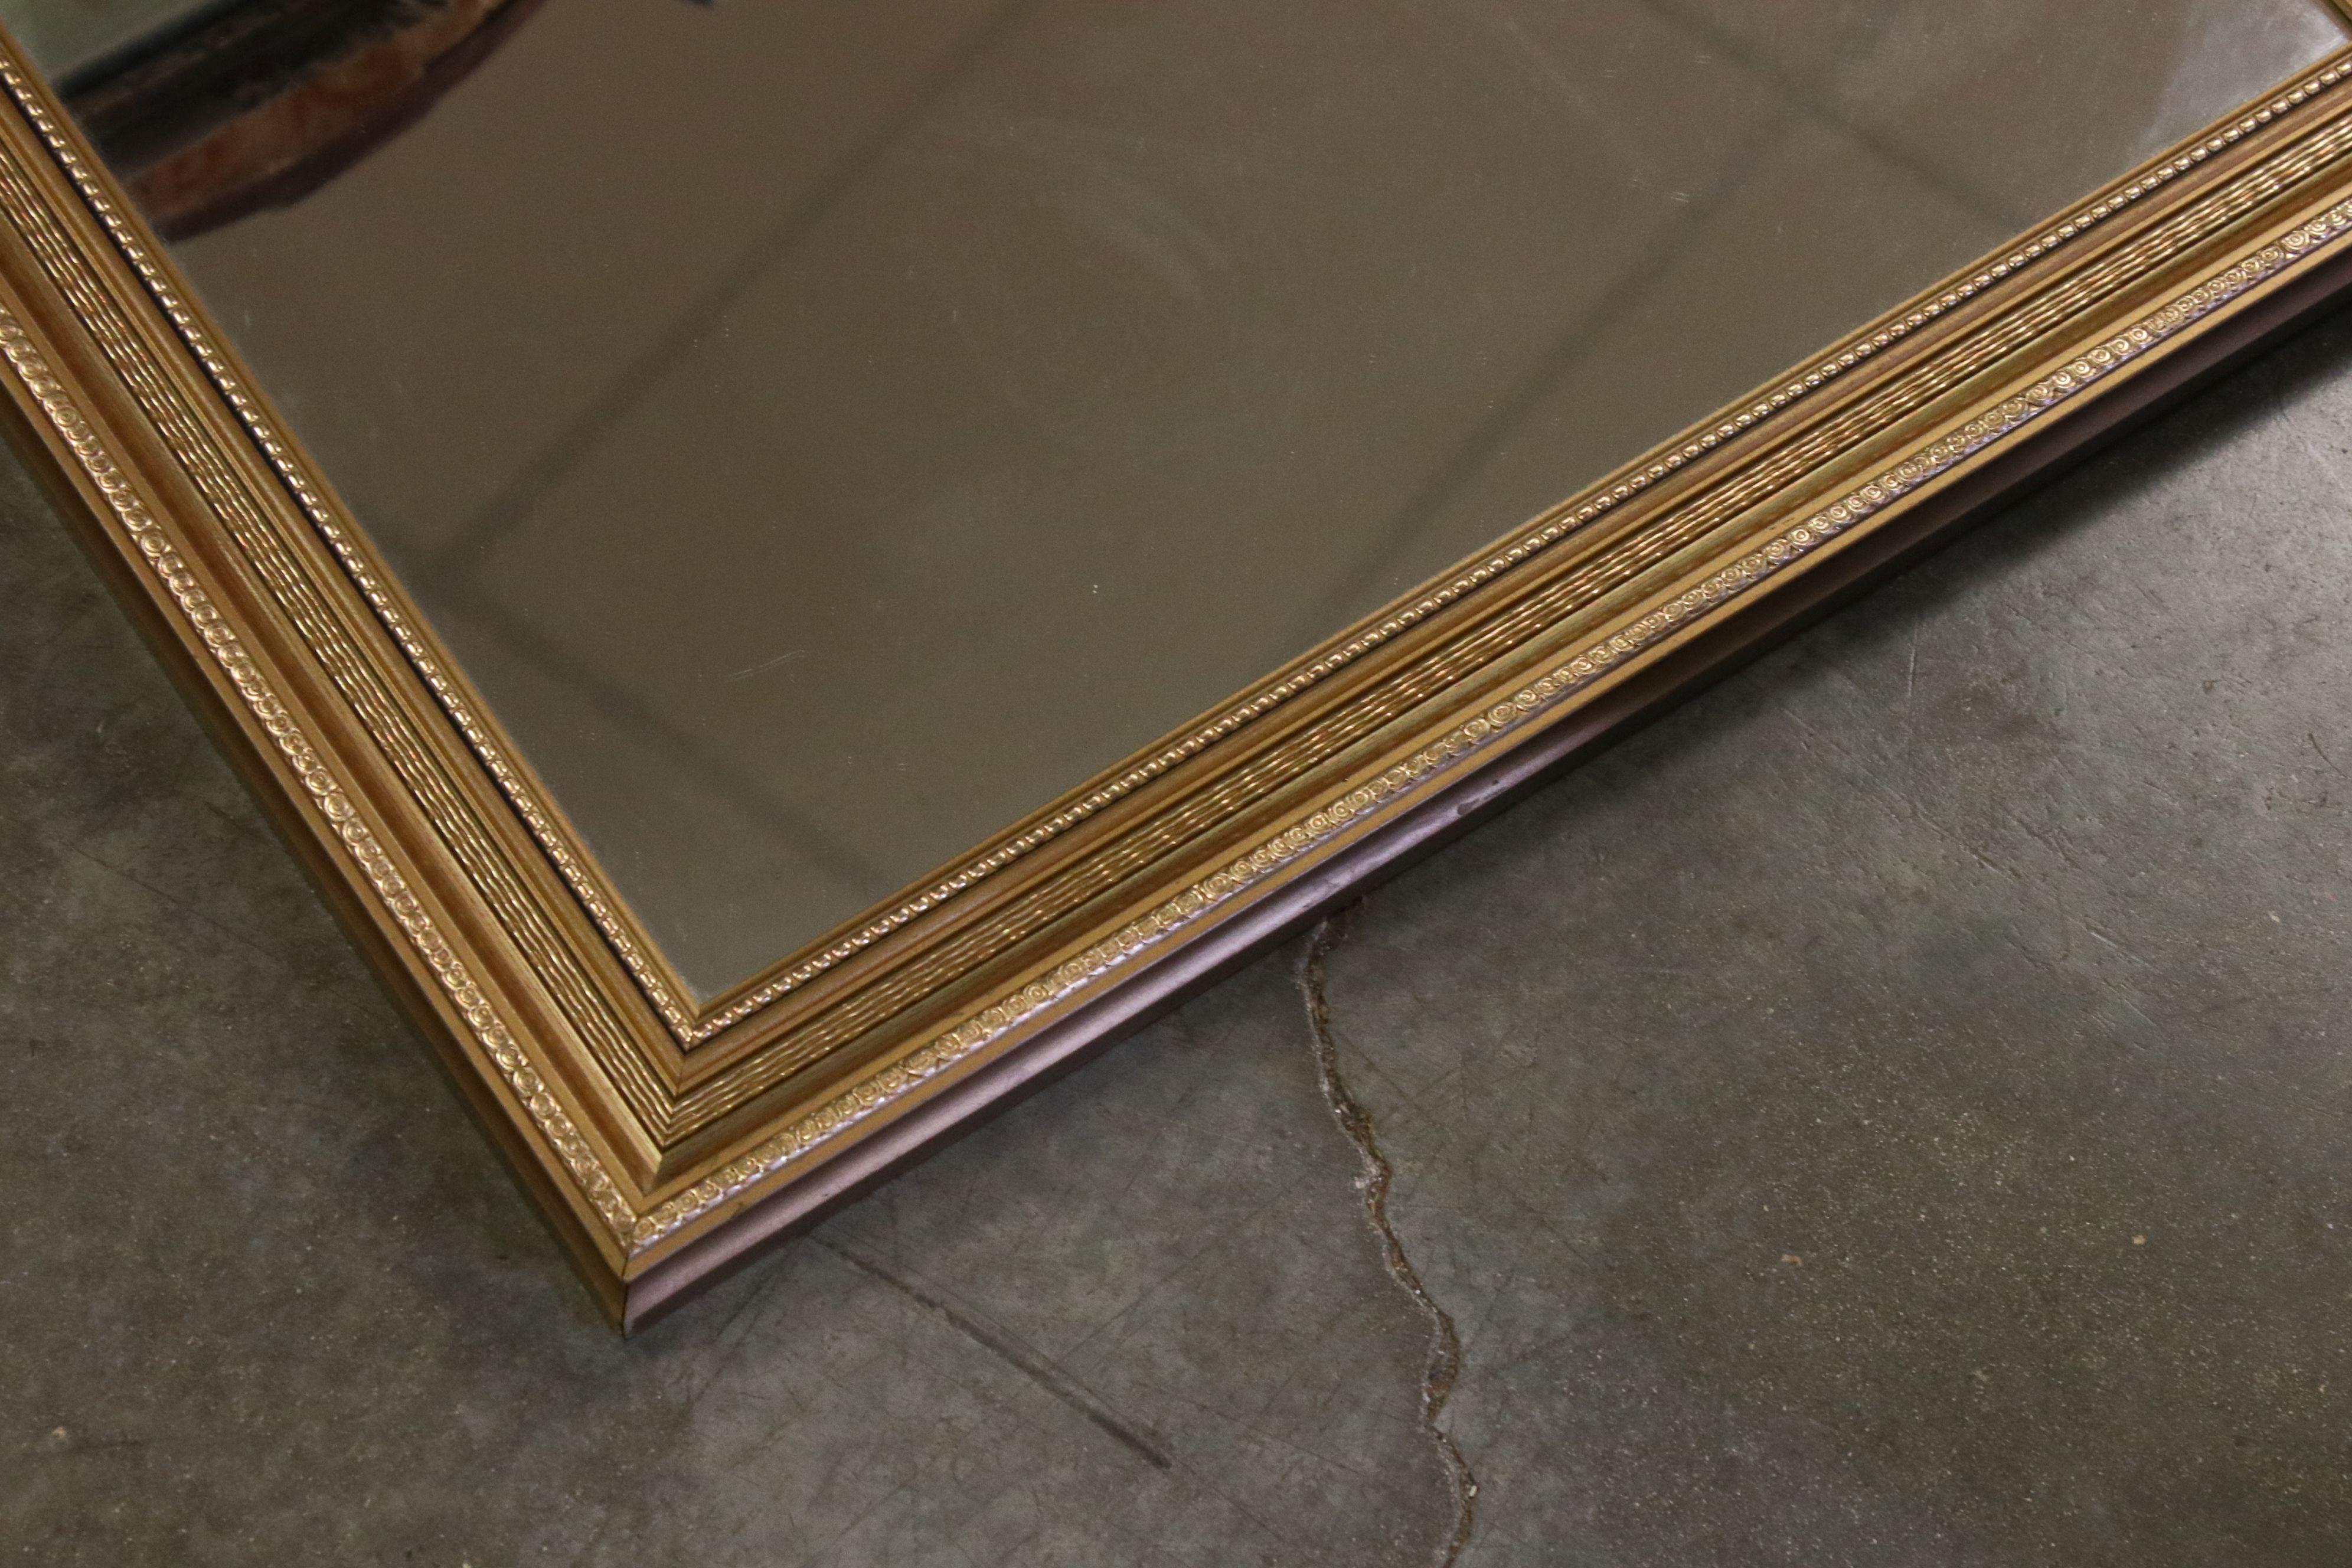 Pair of Rectangular Gilt Framed Mirrors, 44cms x 54cms together with another Gilt Framed Mirror - Image 3 of 3